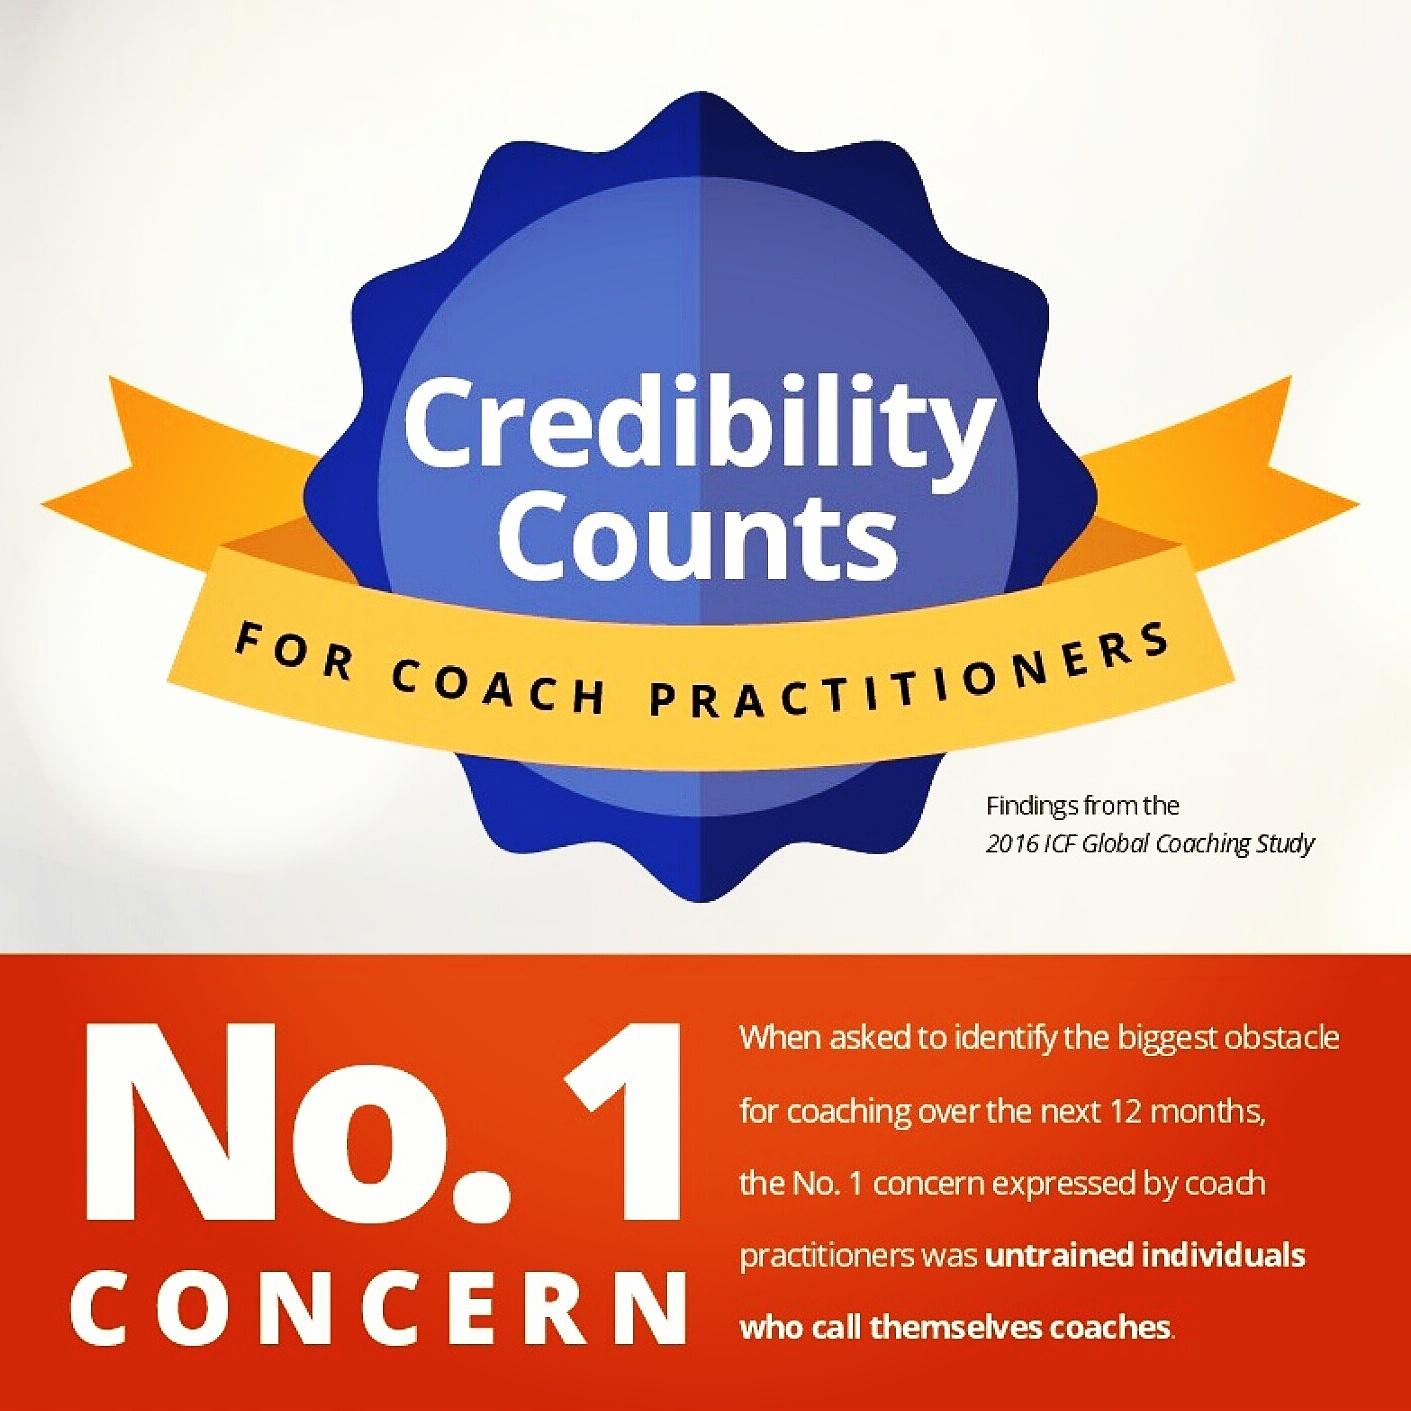 Coach-Yohanes-G_-Pauly-Worlds-Top-Certified-Business-Coach-Business-Coach-Konsultan-Bisnis-GRATYO-Practical-Business-Coaching-International-Coach-Federation-Jakarta-Indonesia